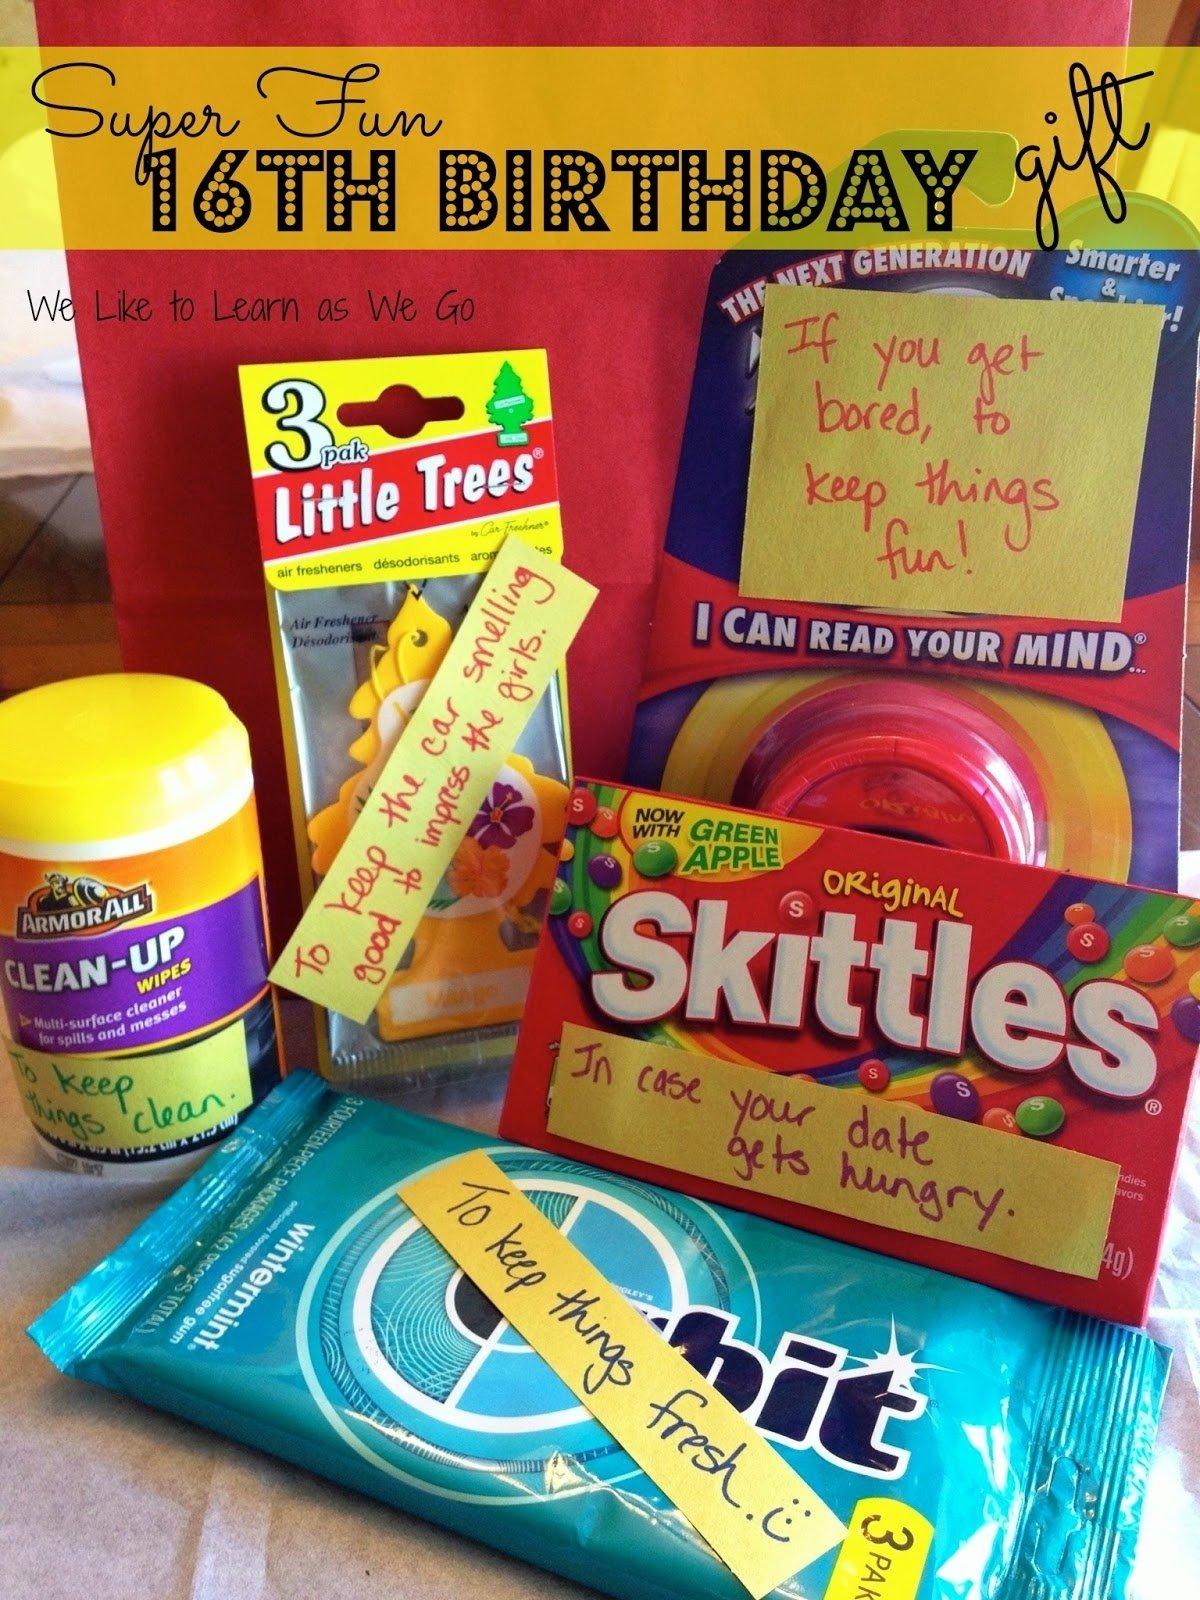 gift ideas for boyfriend: gift ideas for 16 year old boyfriend birthday